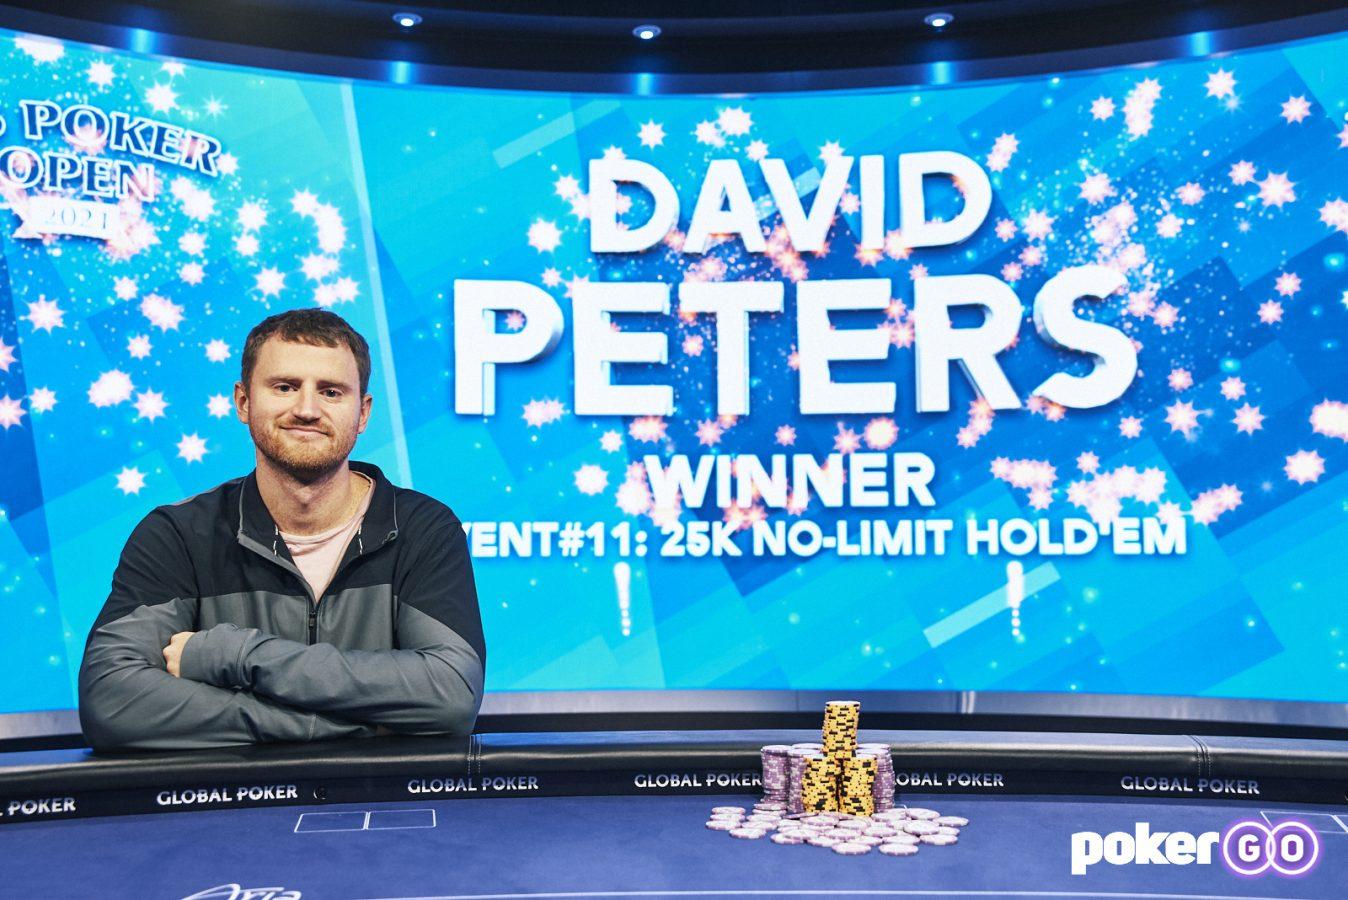 David Peters Wins Takes Down A.S. Poker Open $25.000 untuk Judul #3